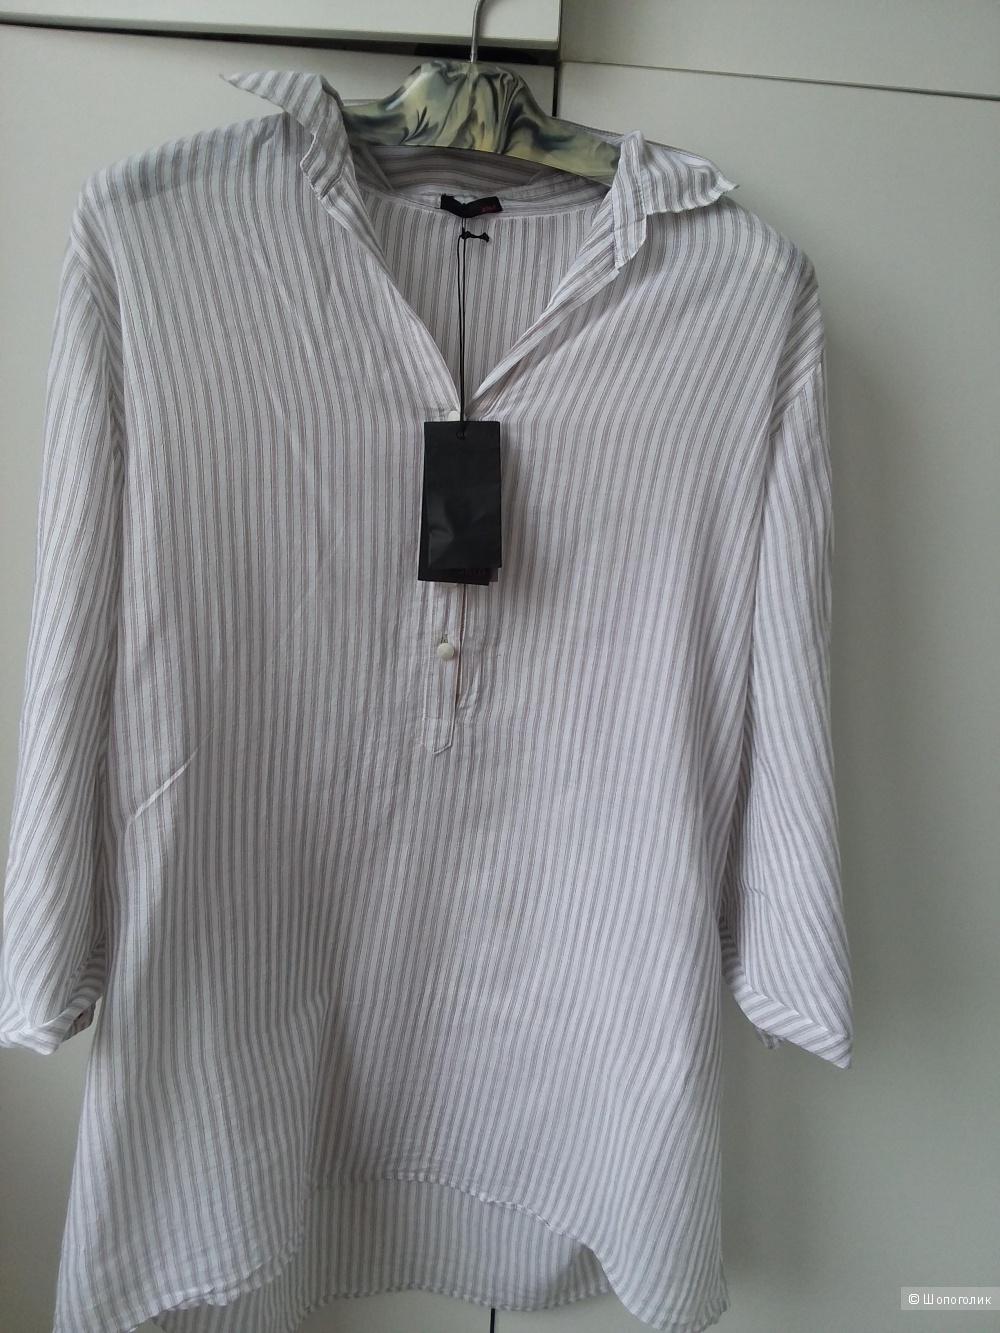 Женская рубашка Pinko Skin c поясом на 46 размер